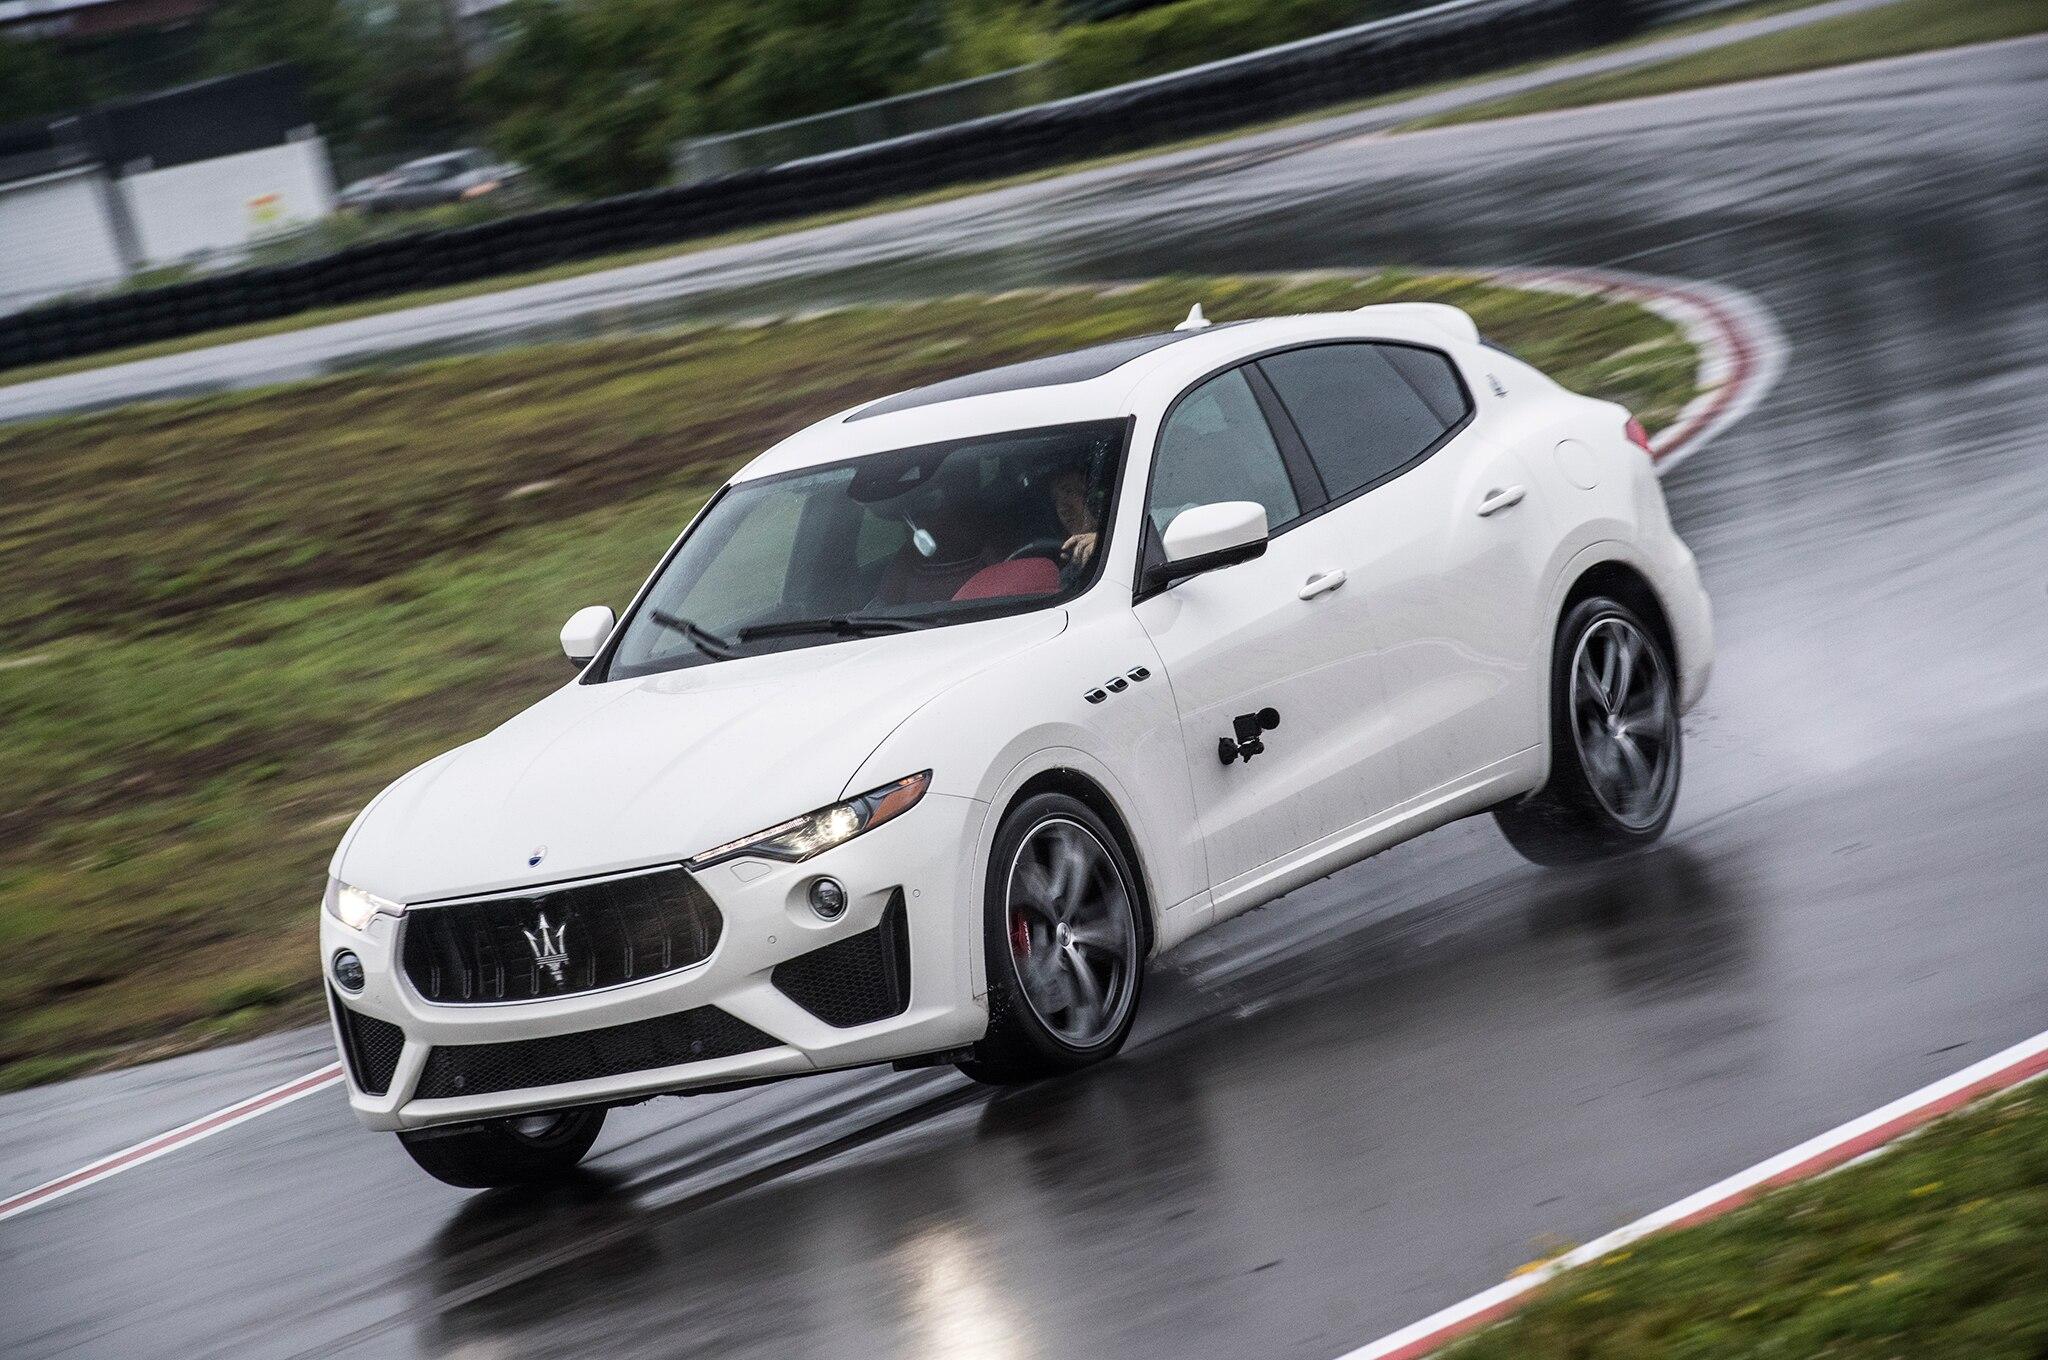 2019 Maserati Levante GTS Front Three Quarter In Motion 03